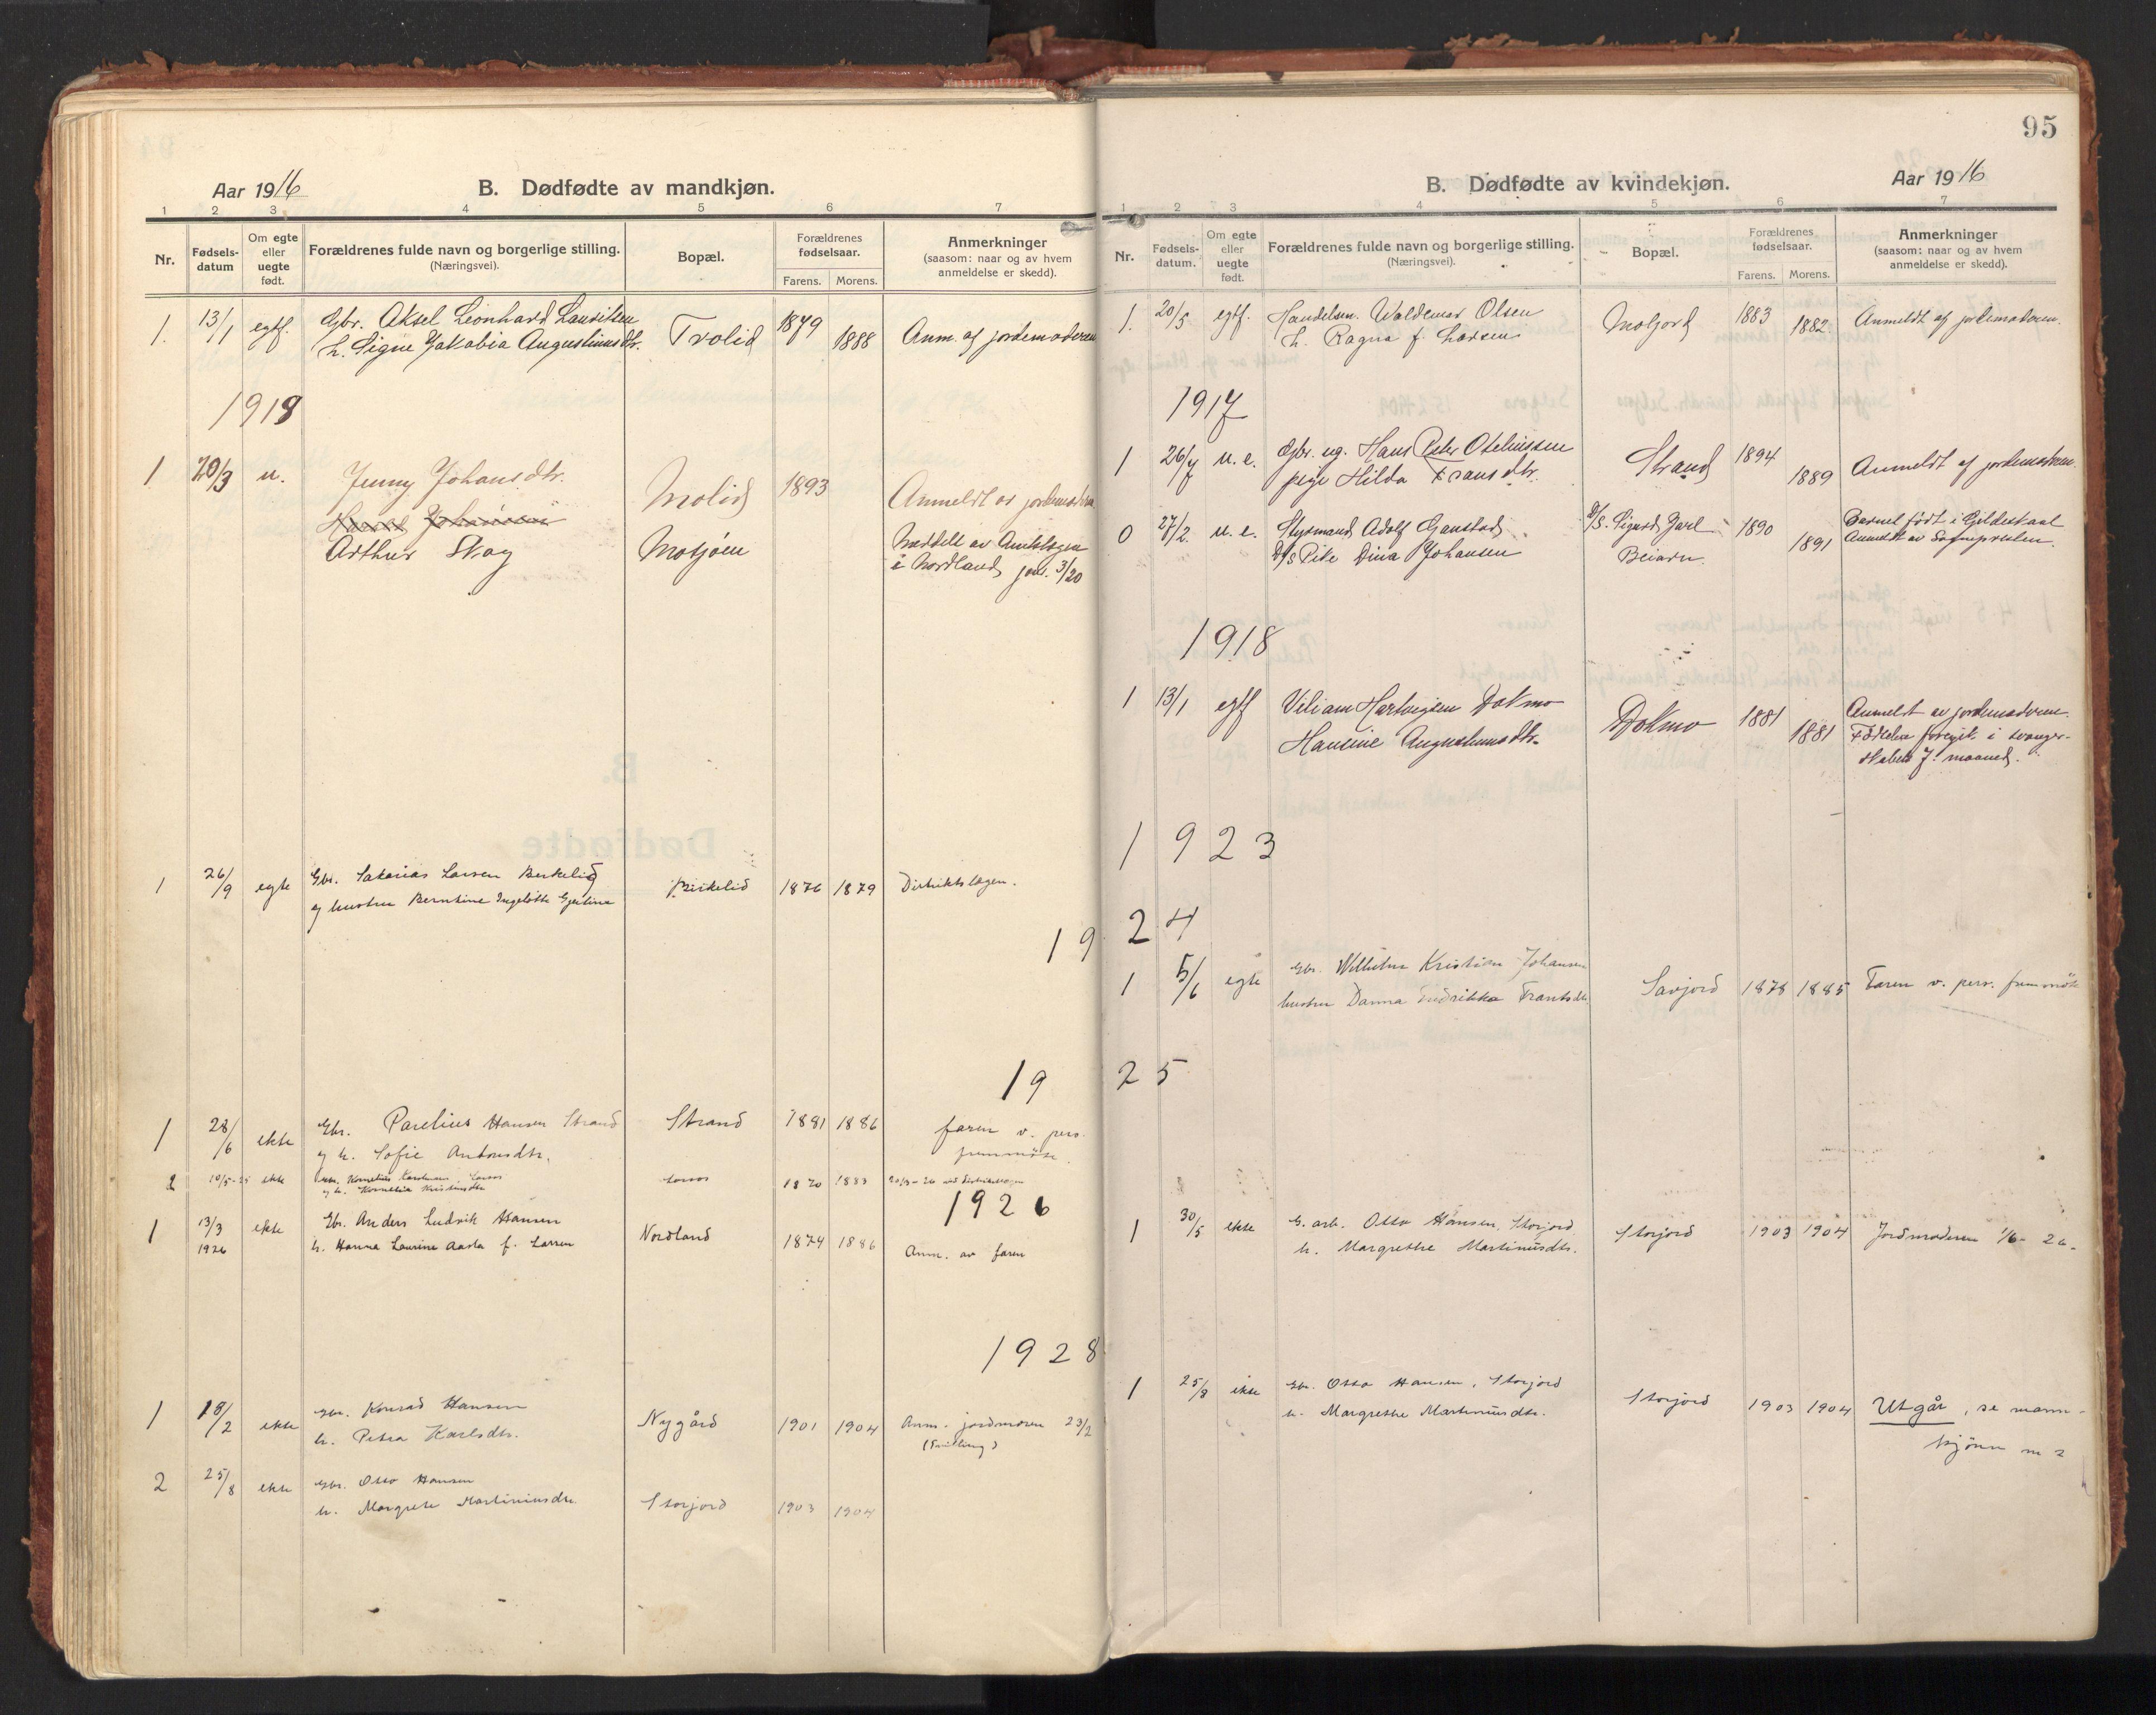 SAT, Ministerialprotokoller, klokkerbøker og fødselsregistre - Nordland, 846/L0650: Ministerialbok nr. 846A08, 1916-1935, s. 95